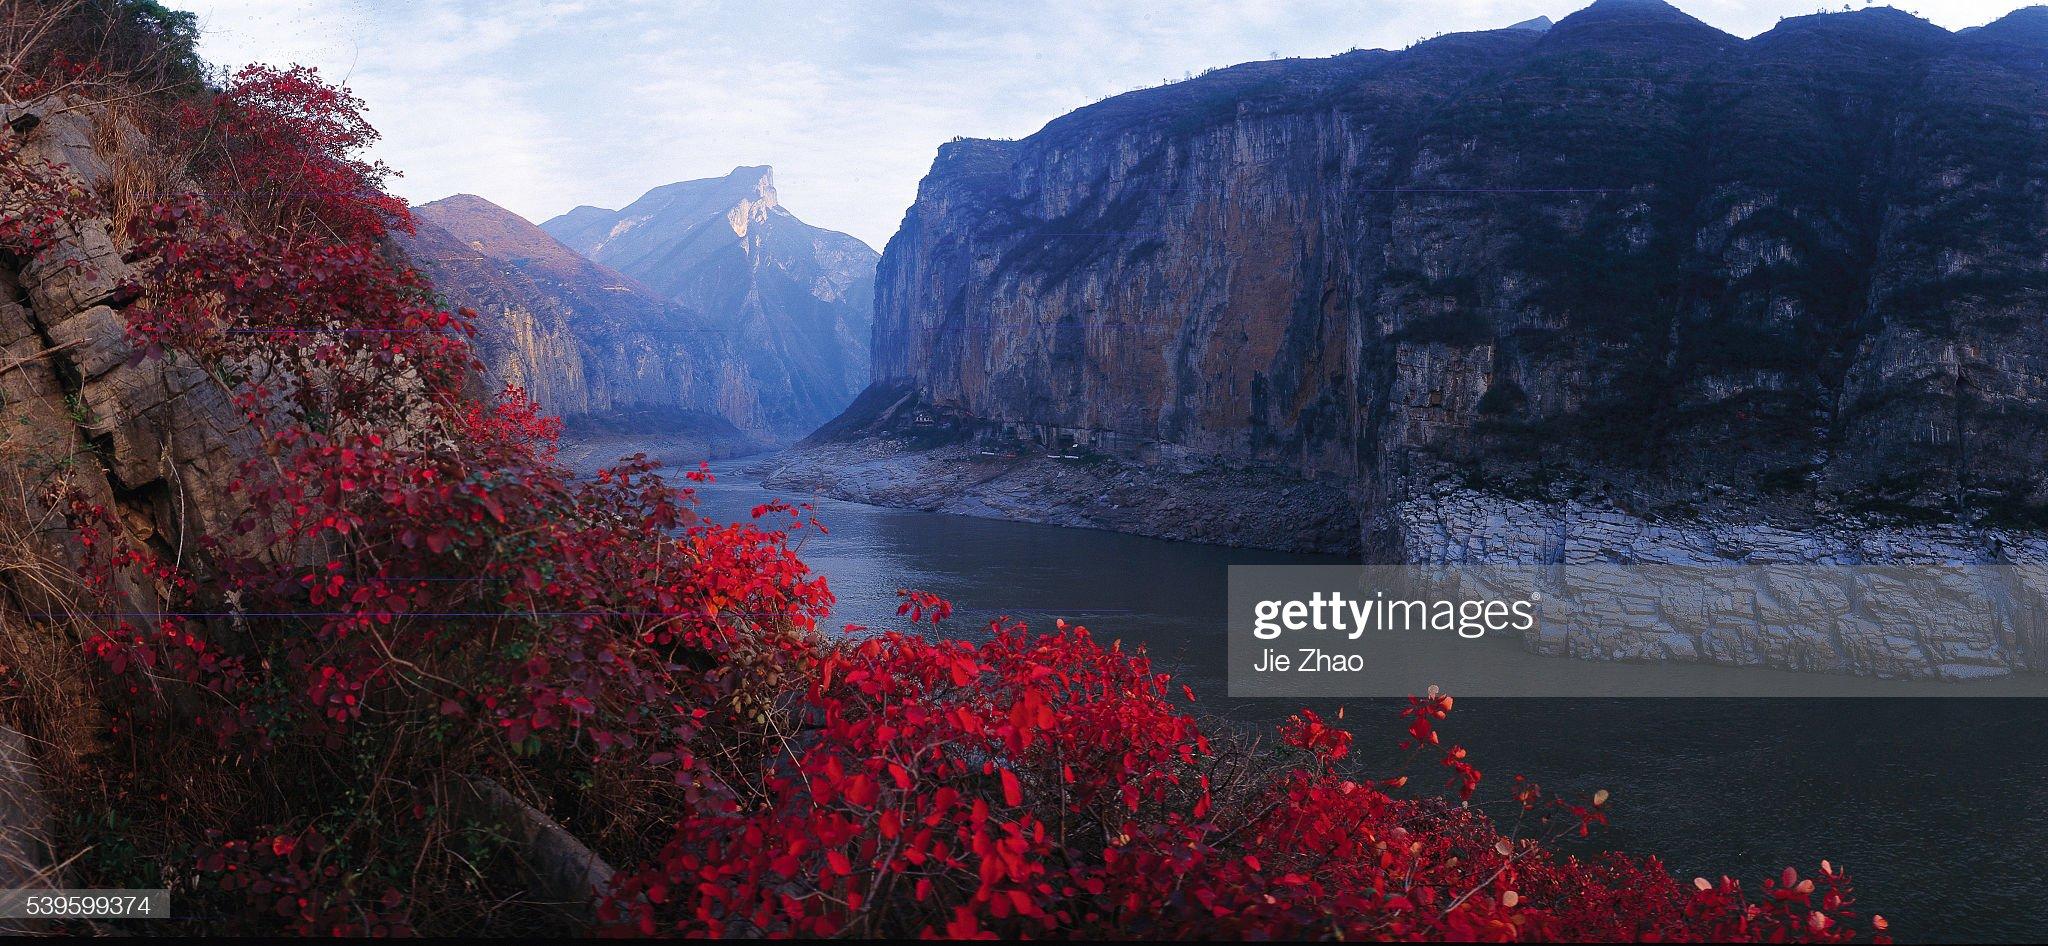 Wu Gorge on the Yangtze River : News Photo